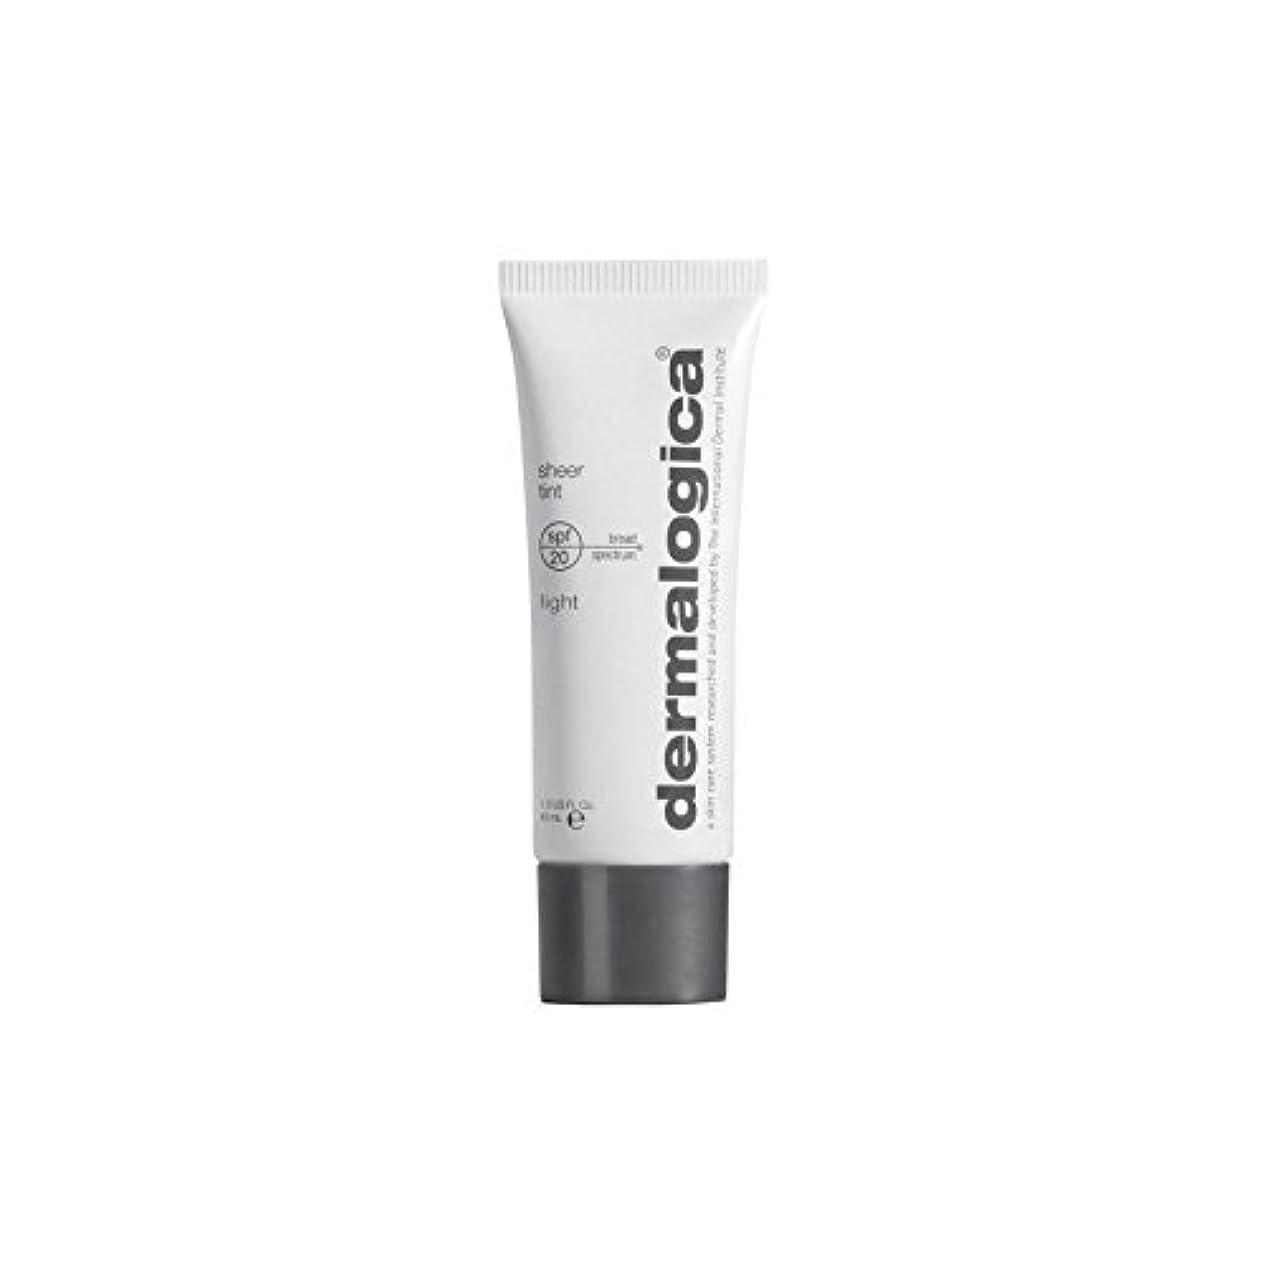 Dermalogica Sheer Tint Spf 20-Light (Pack of 6) - ダーマロジカシアーティント 20光 x6 [並行輸入品]